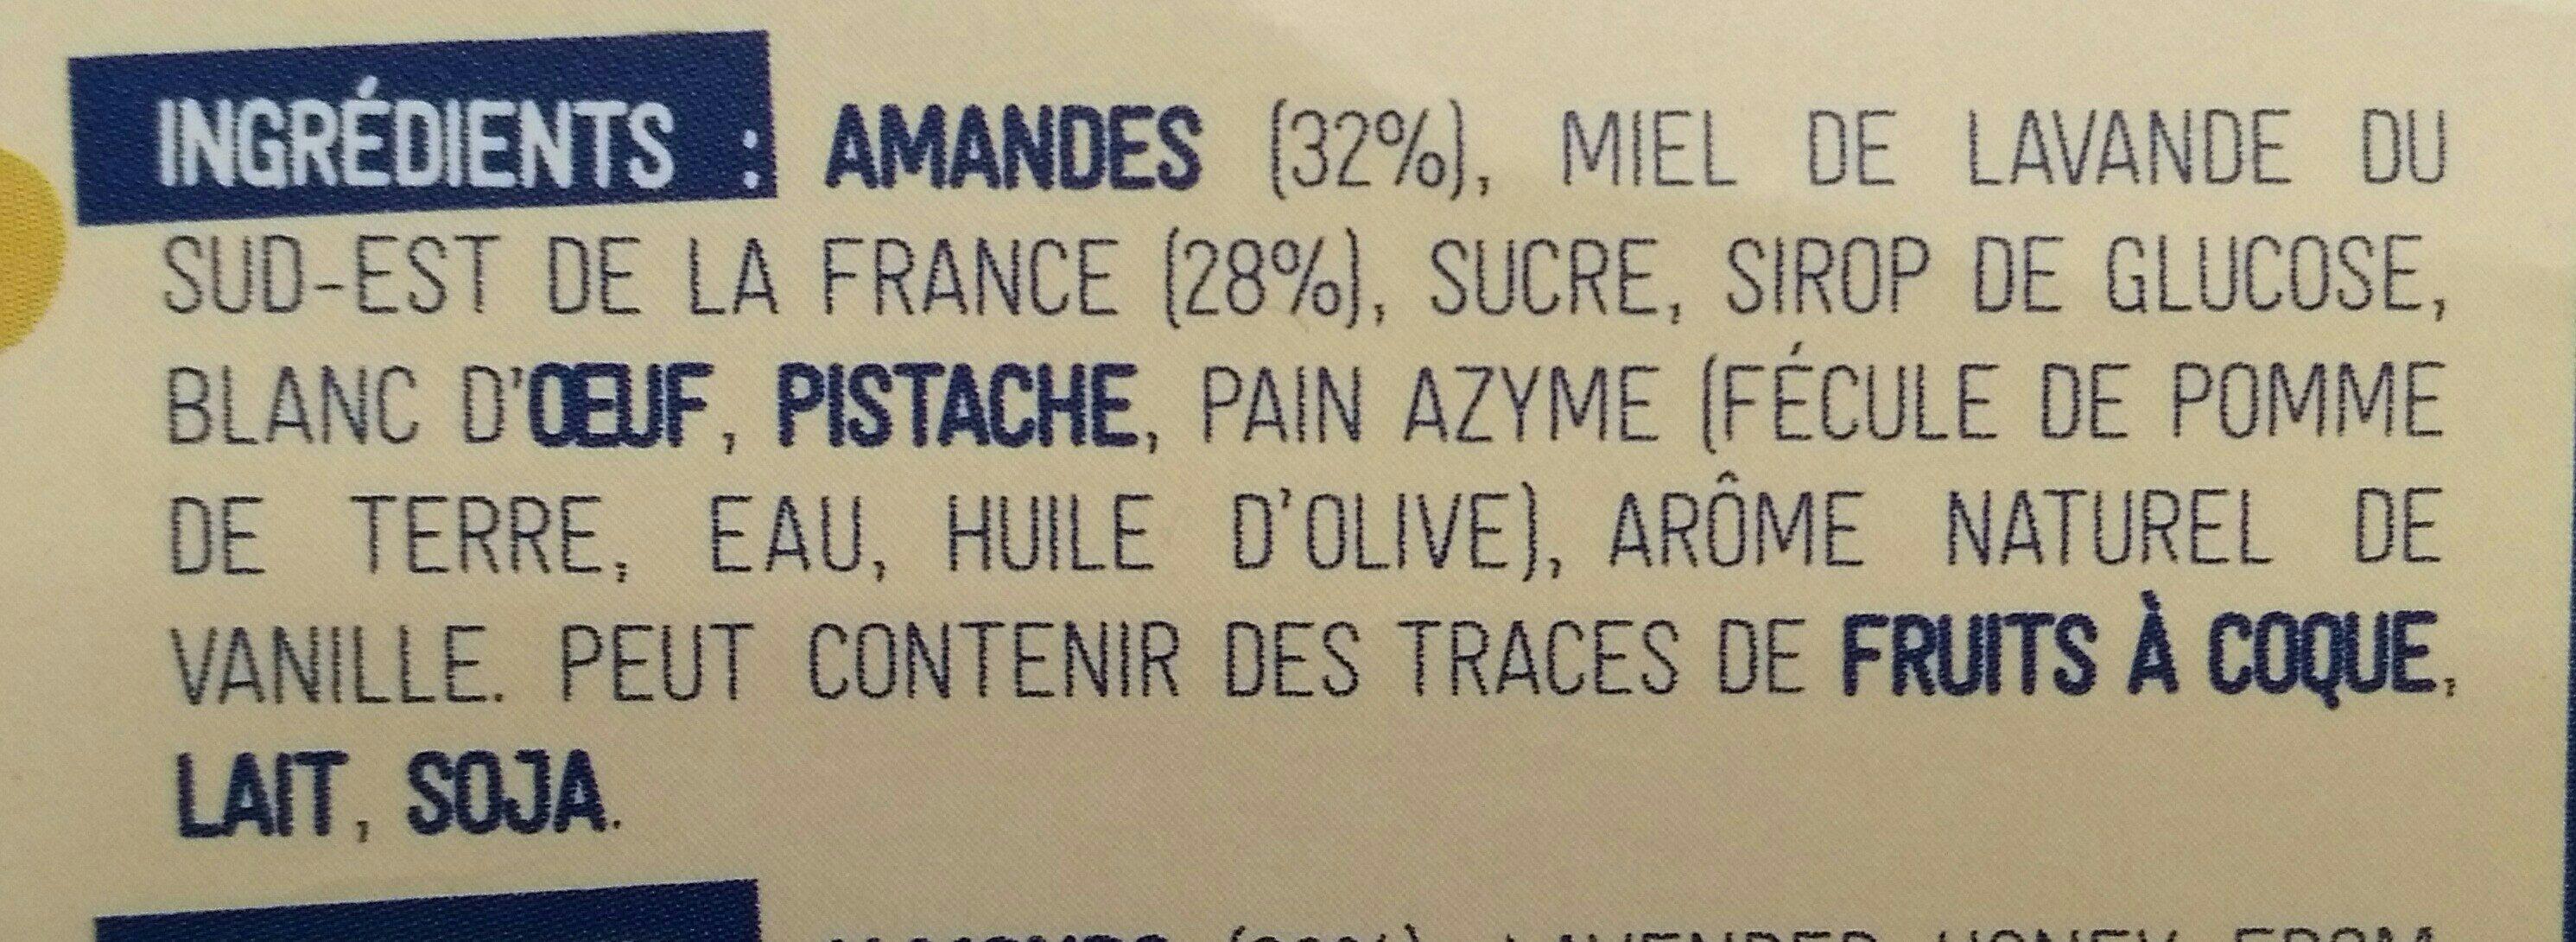 Nougat blanc du Roy René - Ingrédients - fr